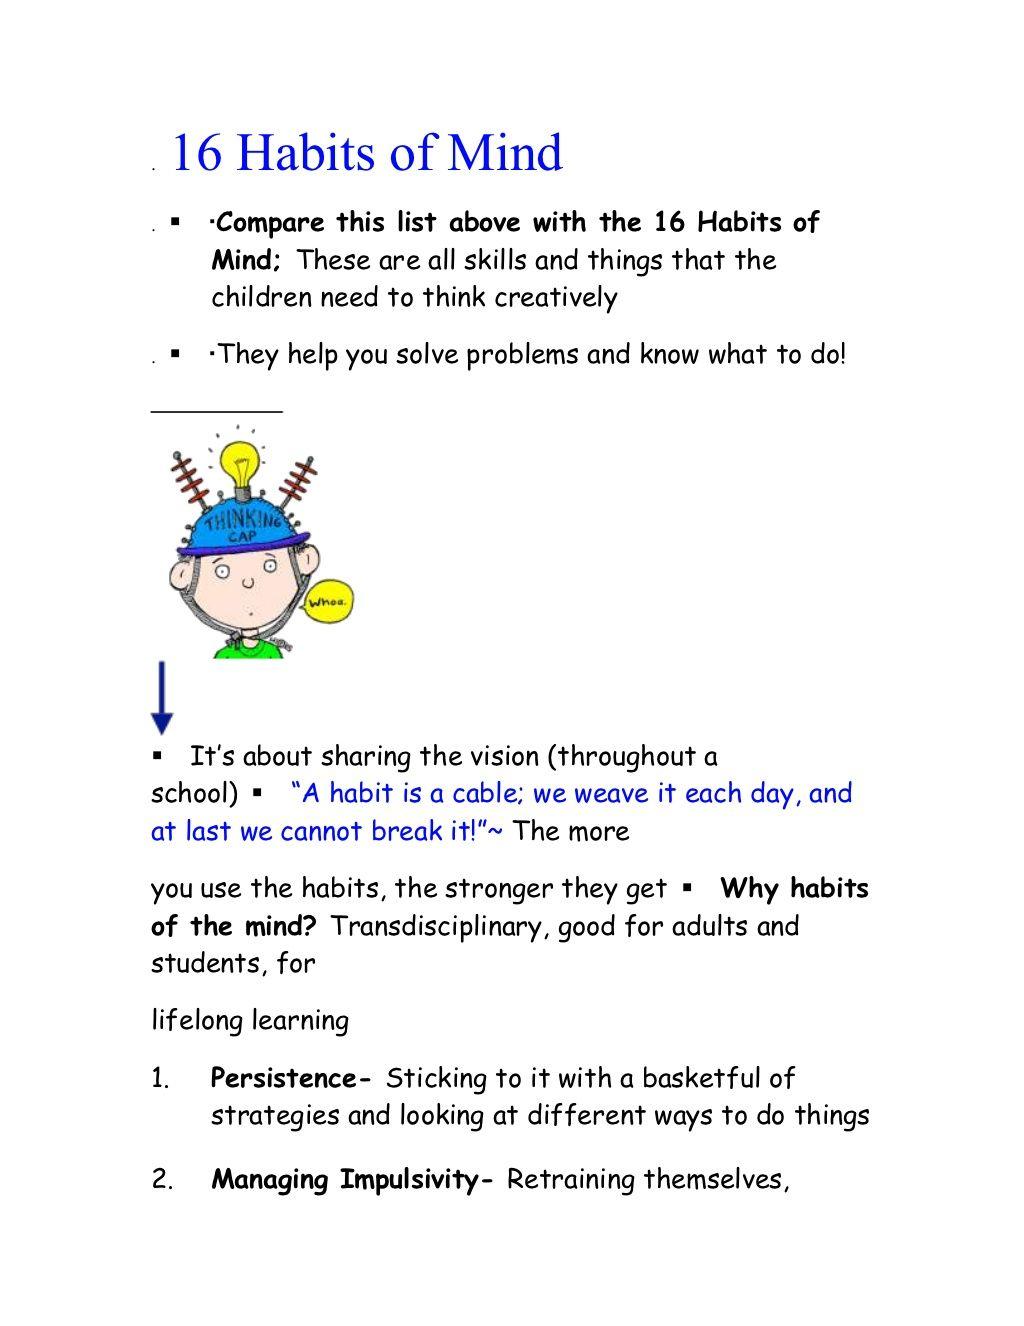 16 Habits Of Mind Student By S J Via Slideshare